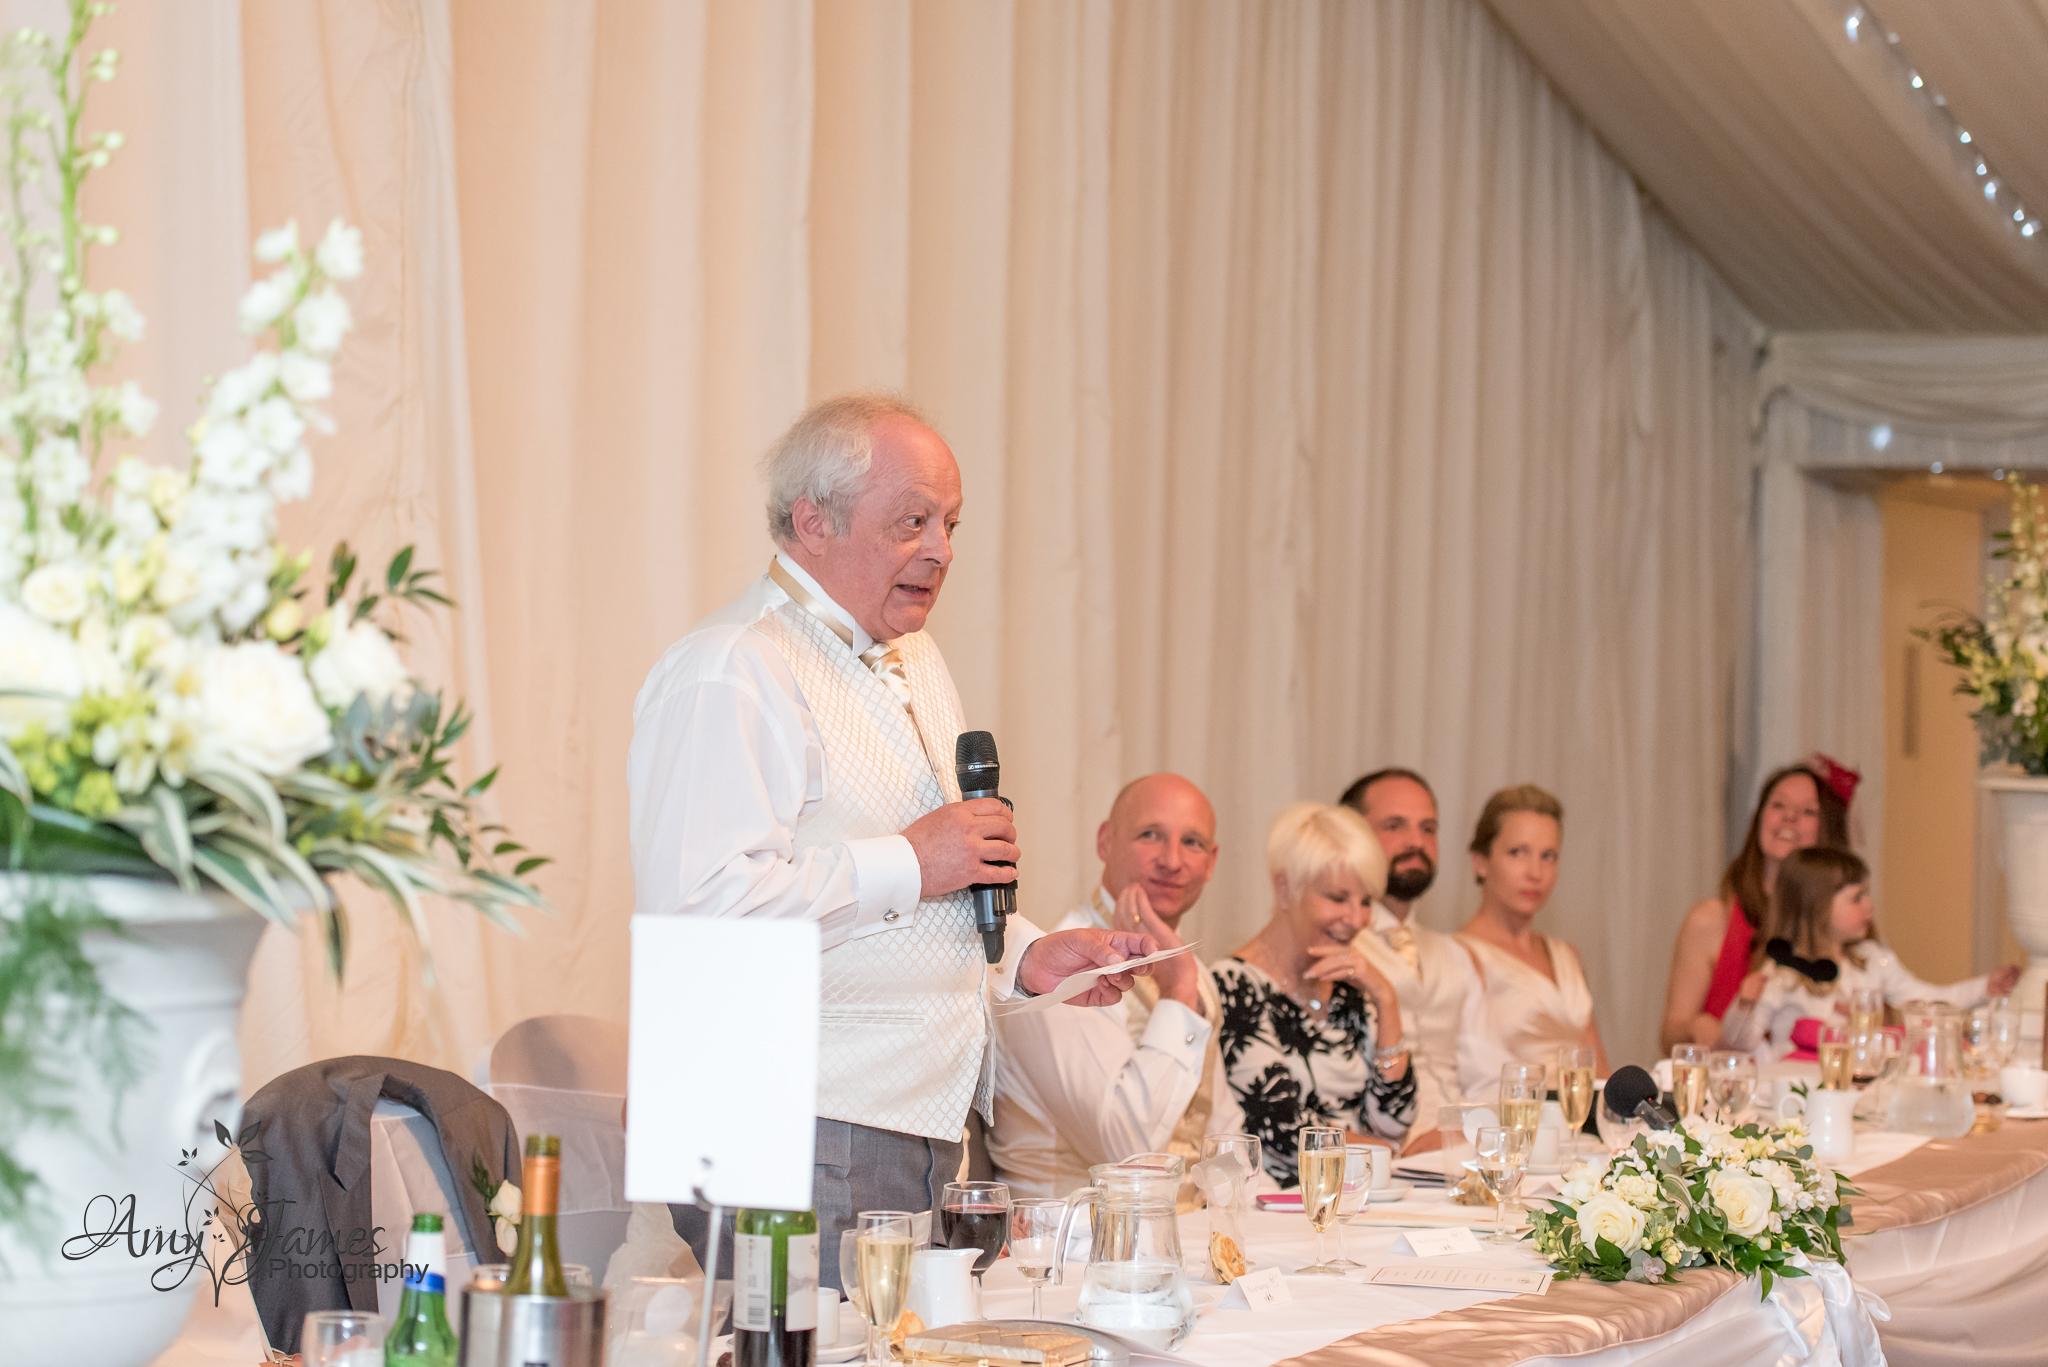 Amy James Photography // Audley Wood Hotel Wedding